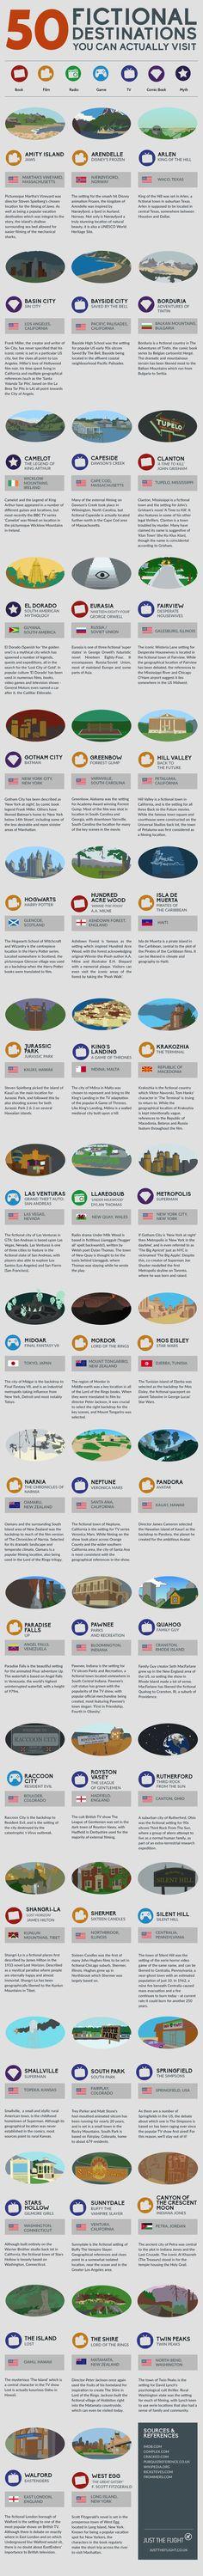 50 Fictional Destinations You Can Actually Visit | ShortList Magazine